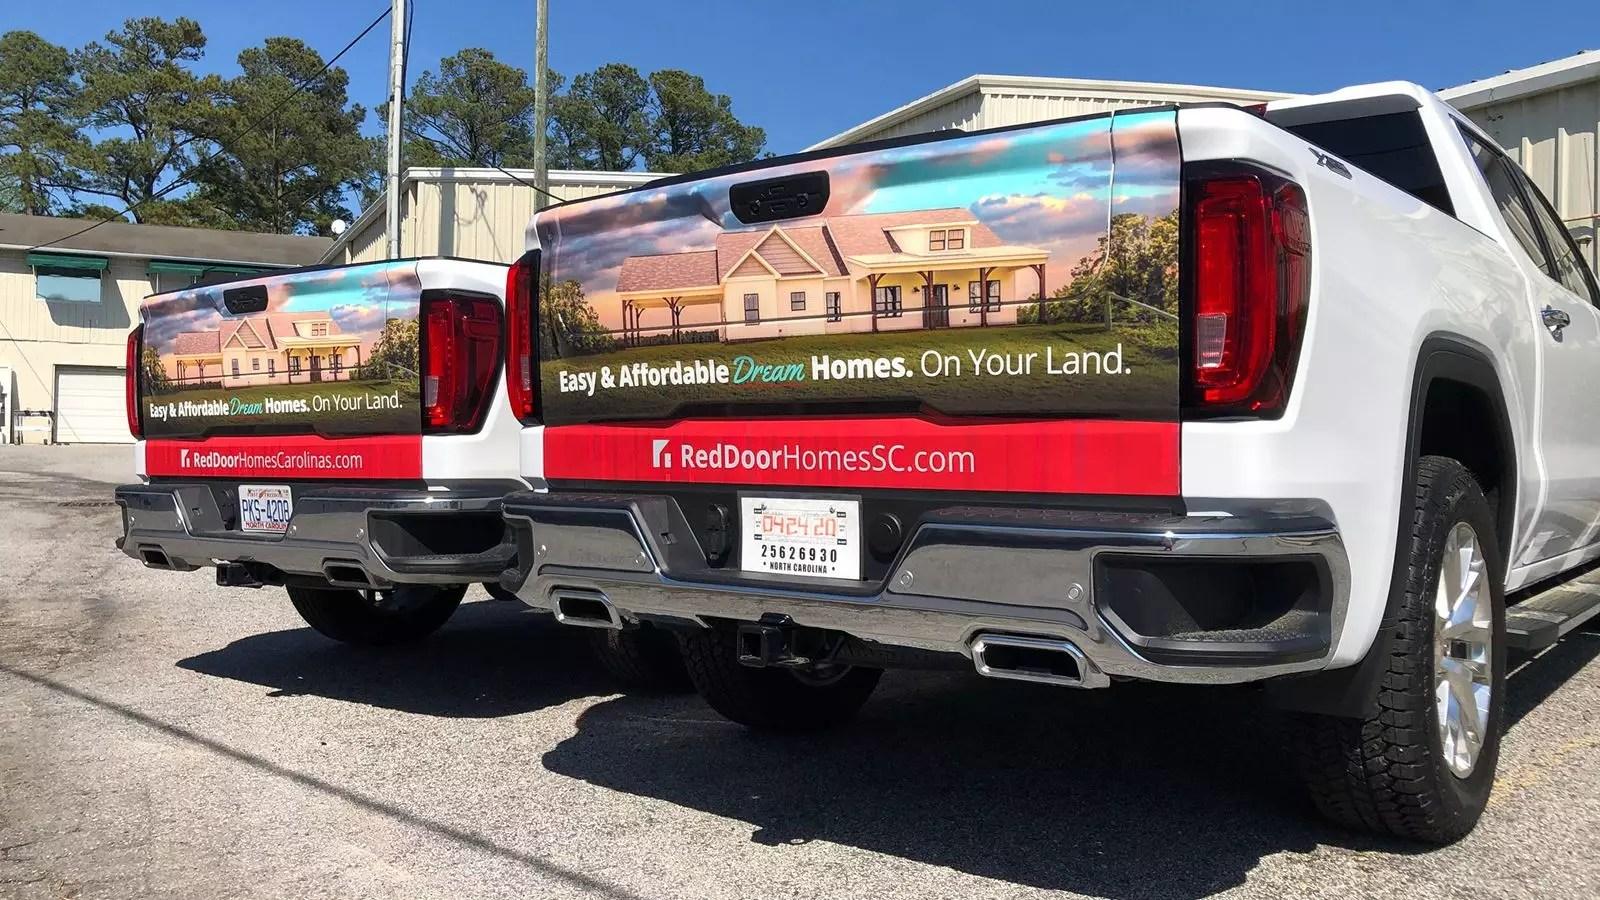 North Carolina Pick-Up Truck Tailgate Wraps